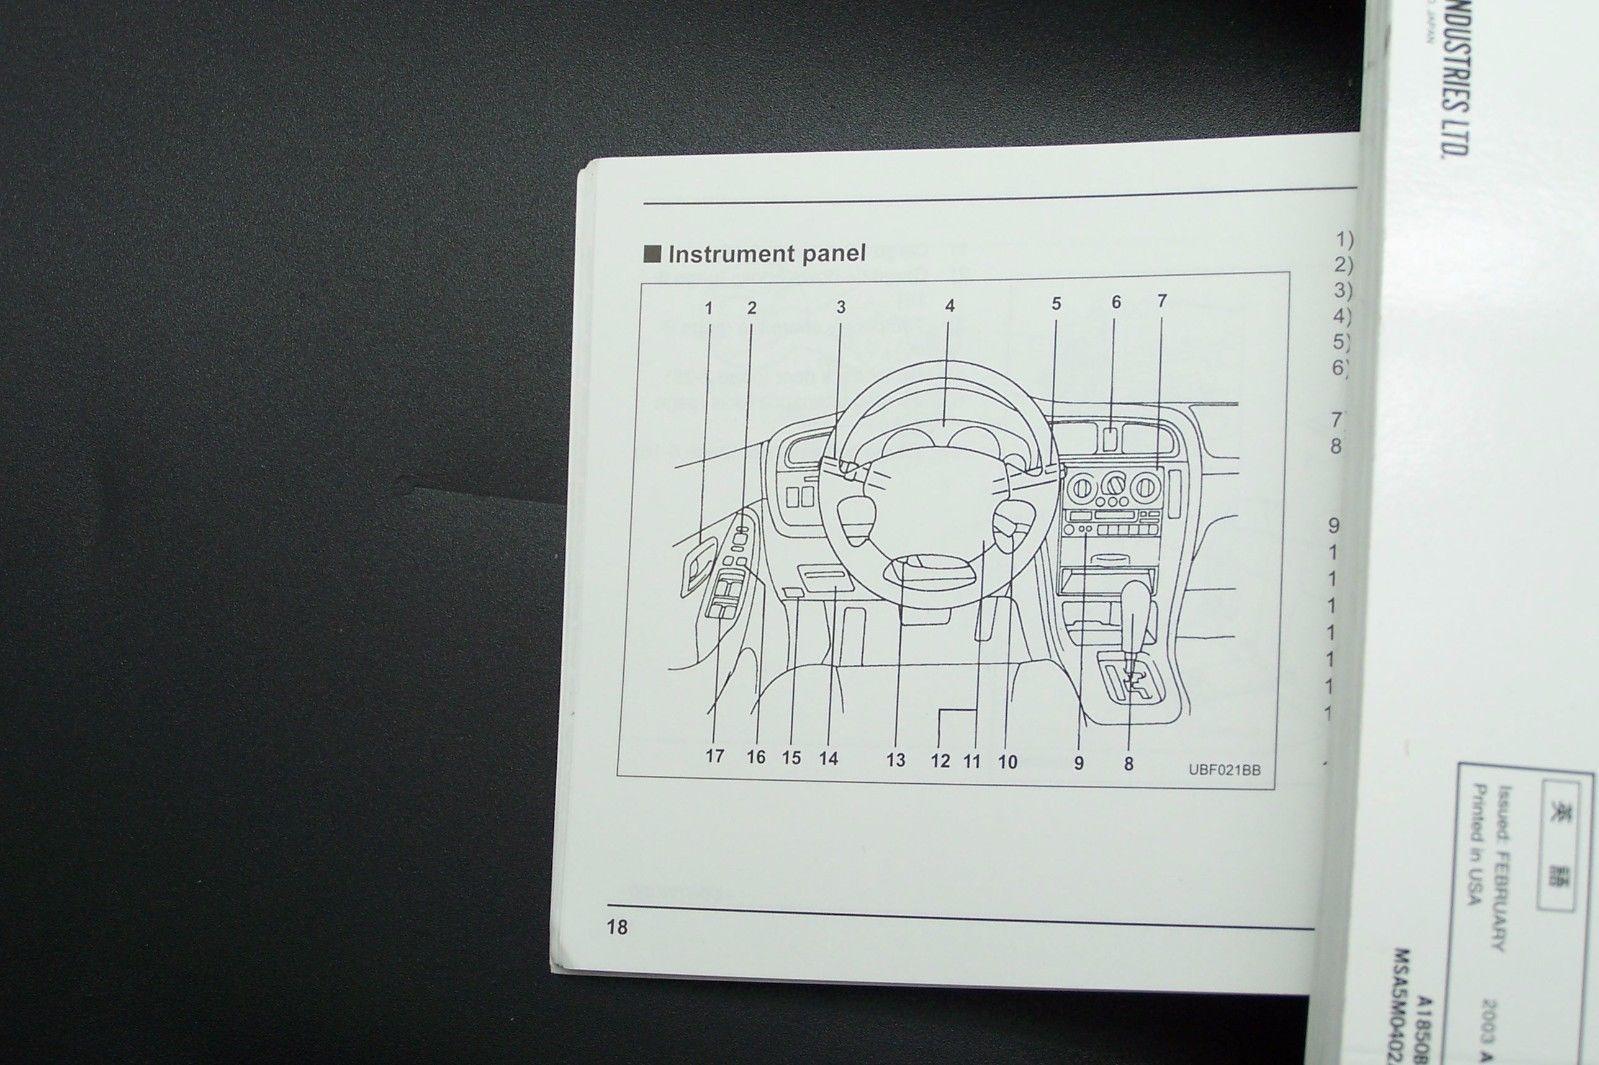 2004 subaru baja owners manual new original parts service